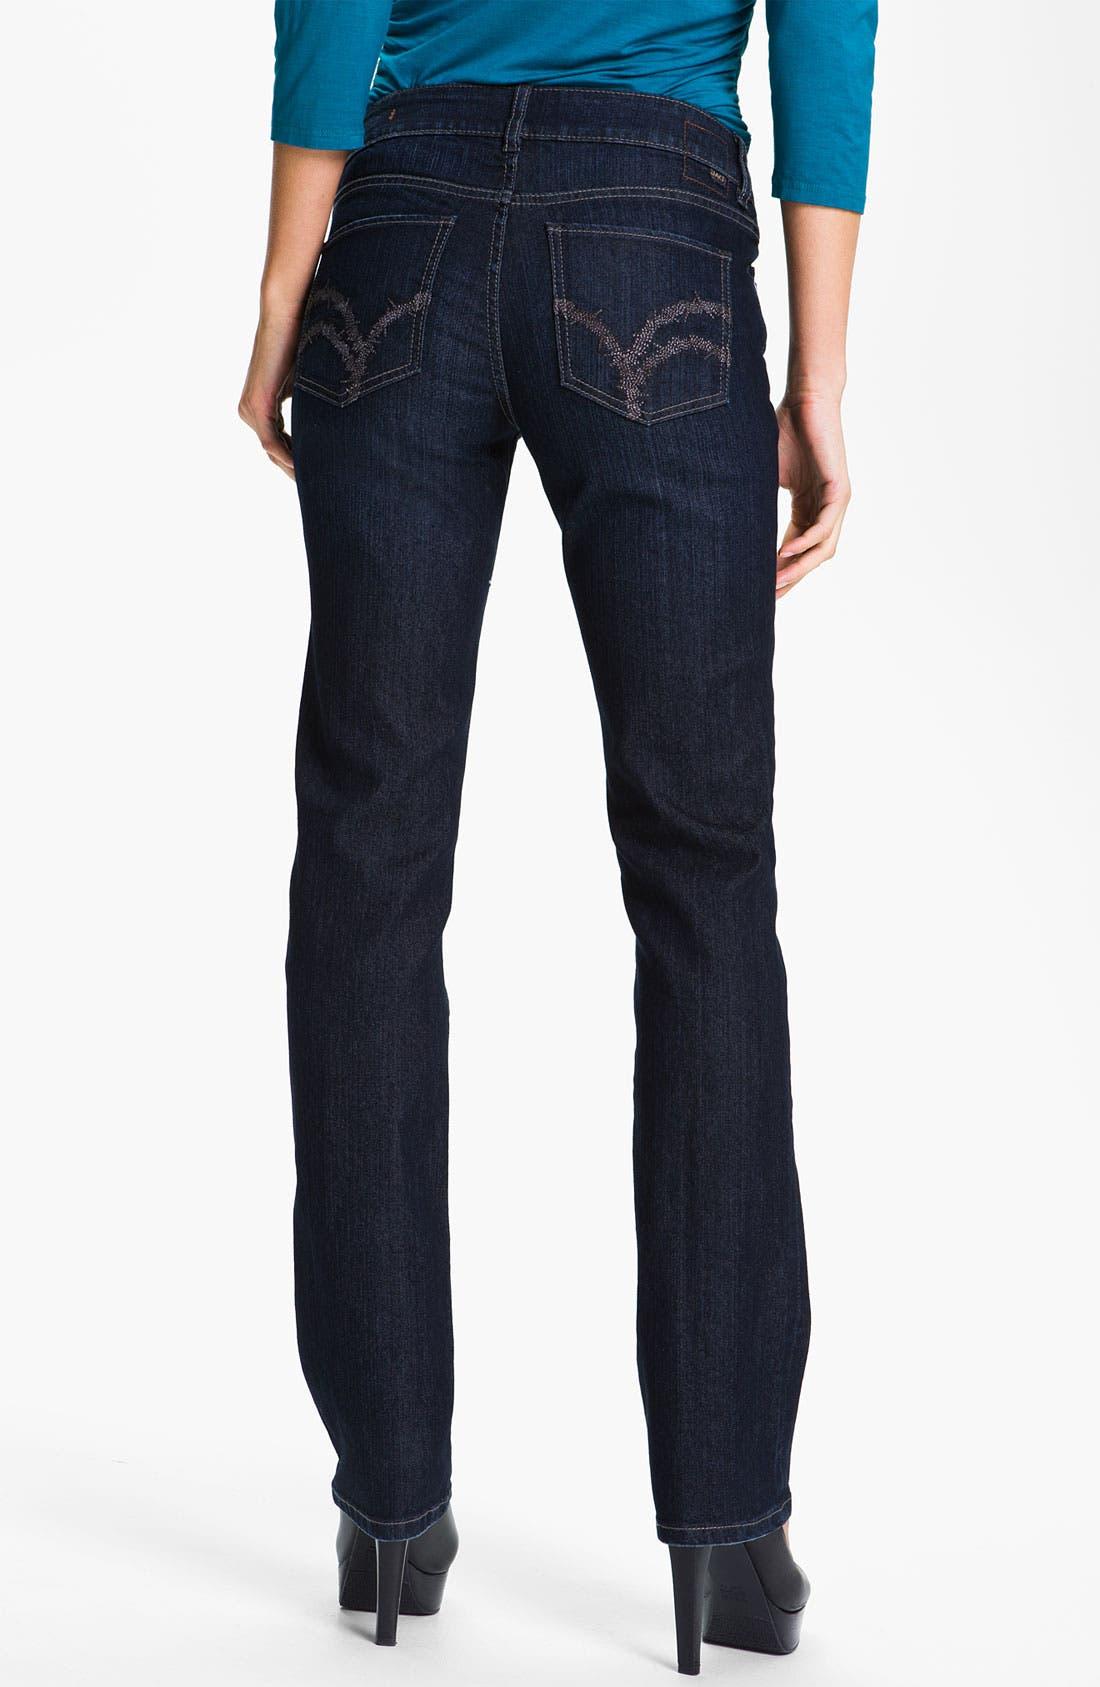 Alternate Image 2  - Jag Jeans 'Eden' Straight Leg Jeans (Indigo) (Petite)